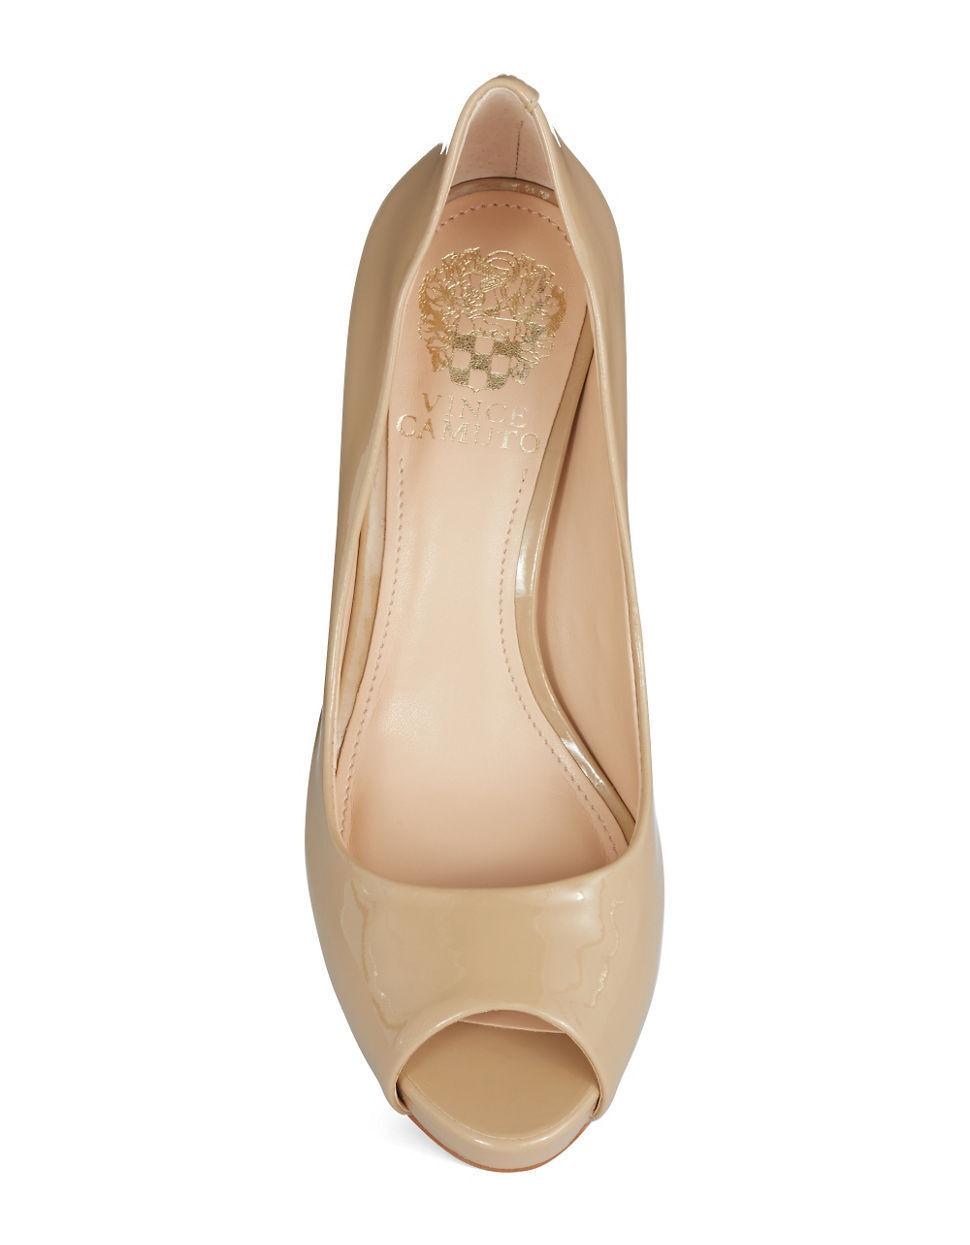 Women's VINCE CAMUTO Kiley Patent Leather Pumps, Size 11 11 11 Nude VC-KILEY 4b7ce9